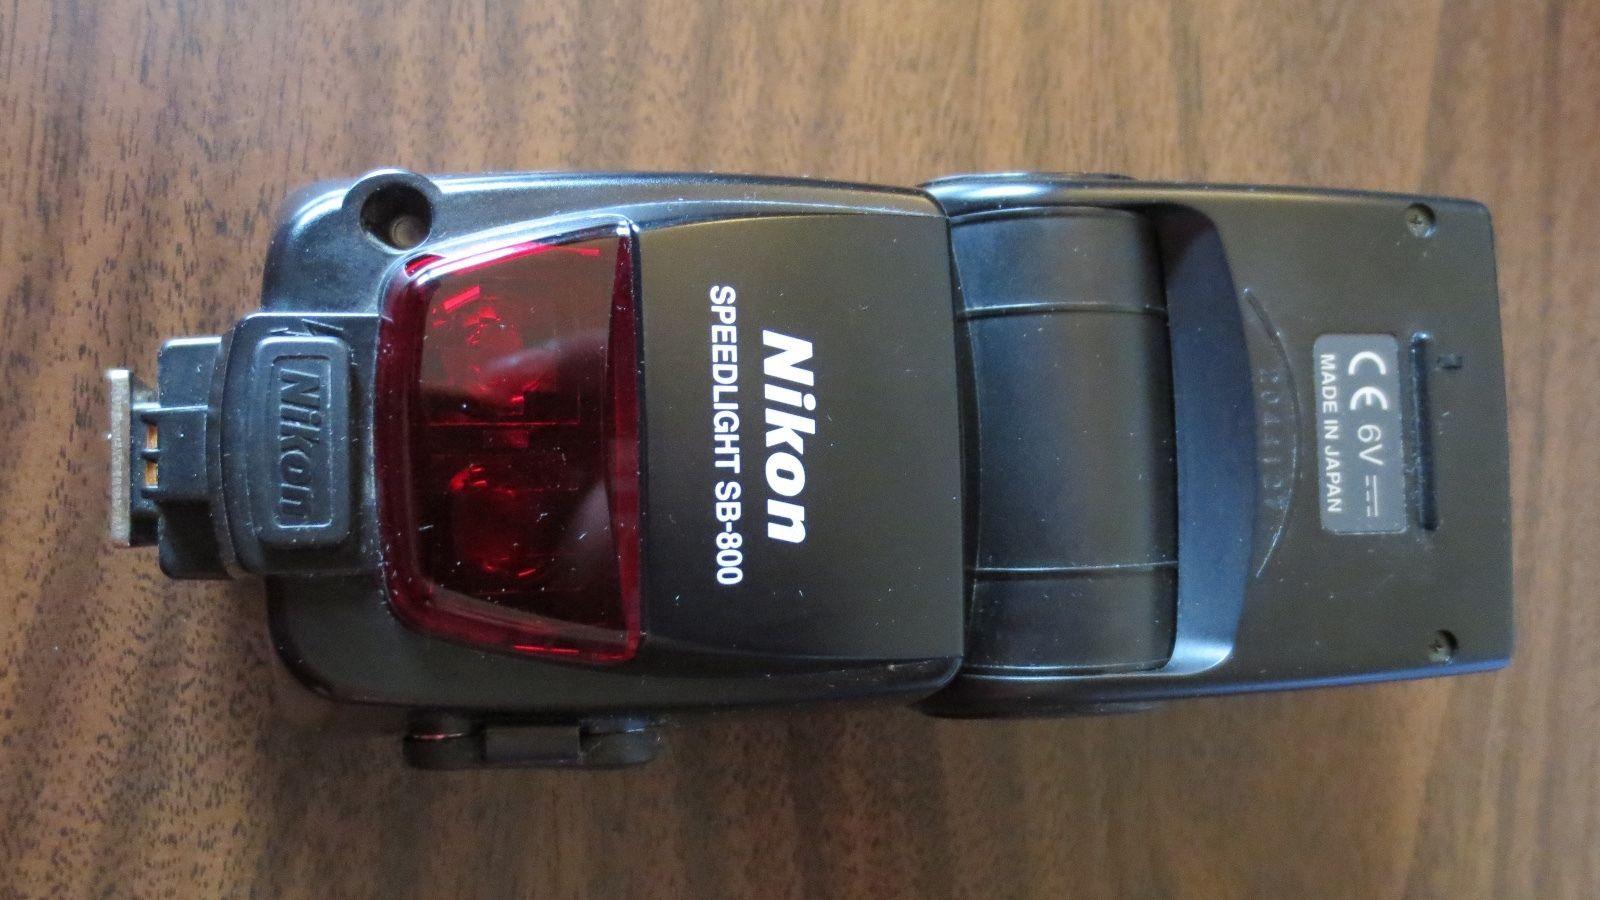 Nikon speedlight sb 800 shoe mount flash for nikon common nikon speedlight sb 800 shoe mount flash for nikon baditri Images